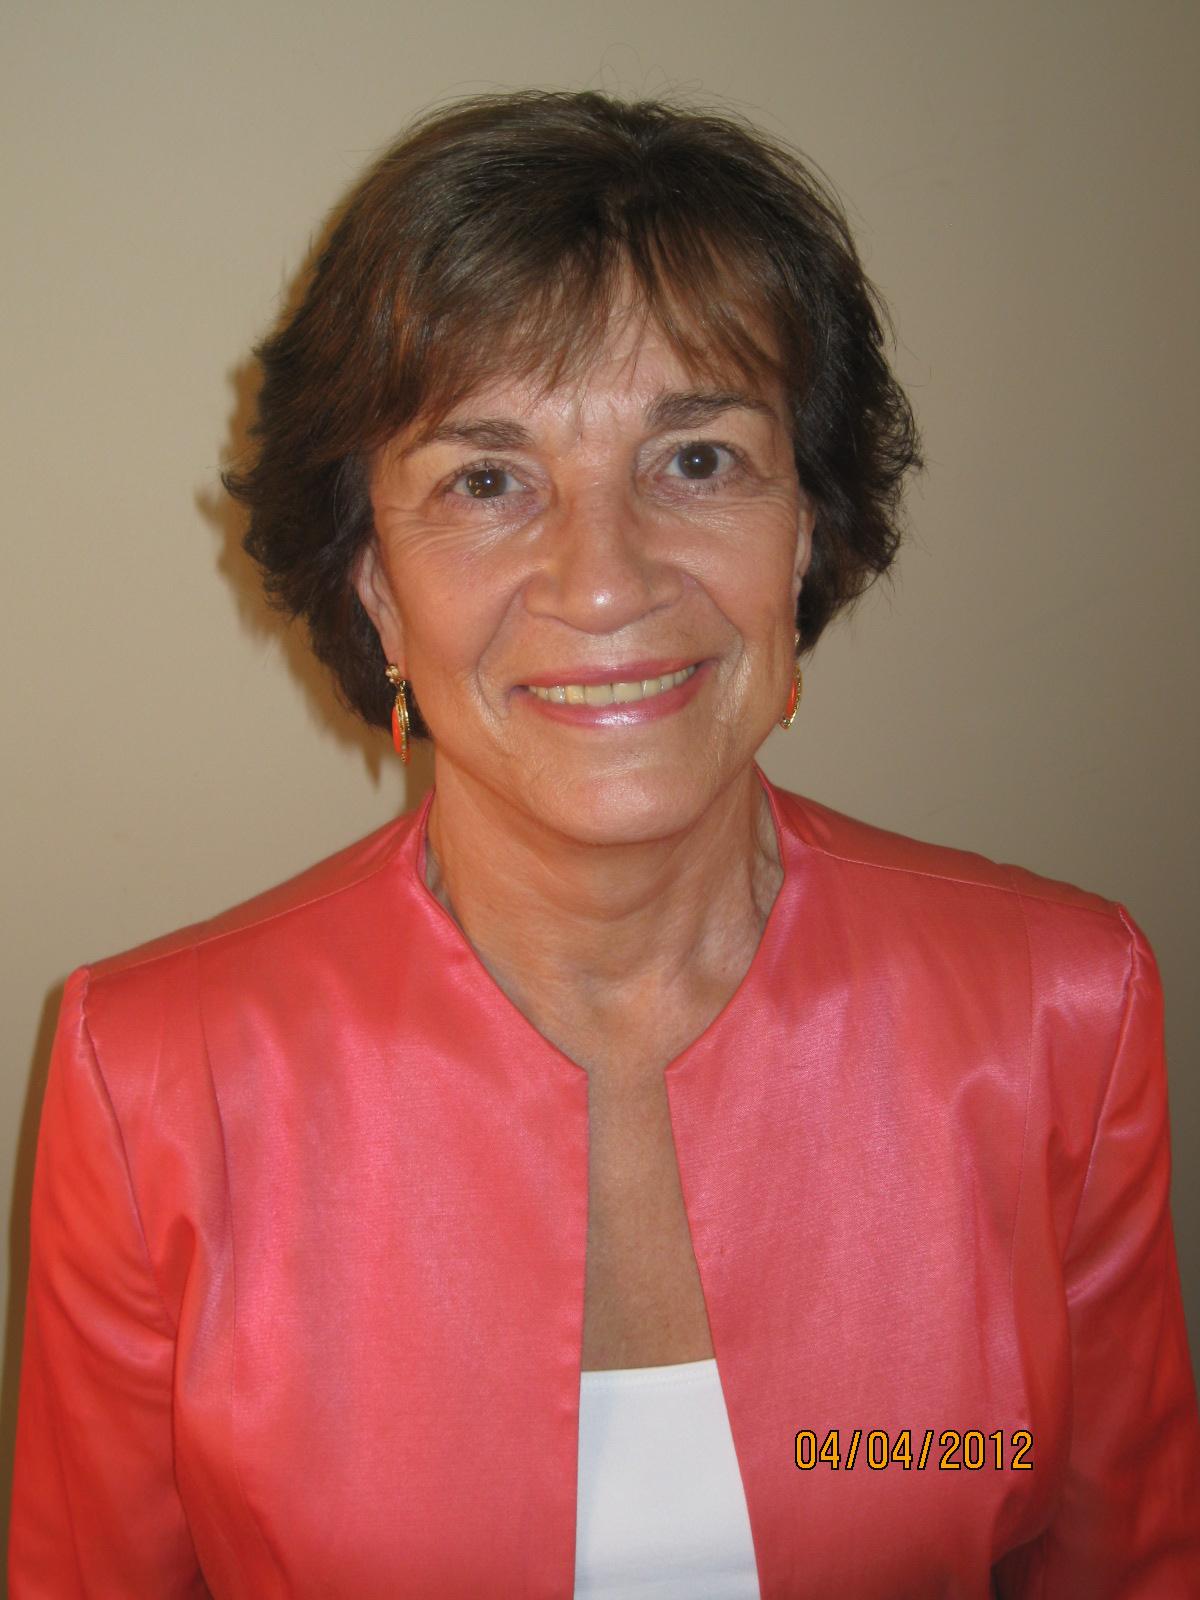 Anita L Bains